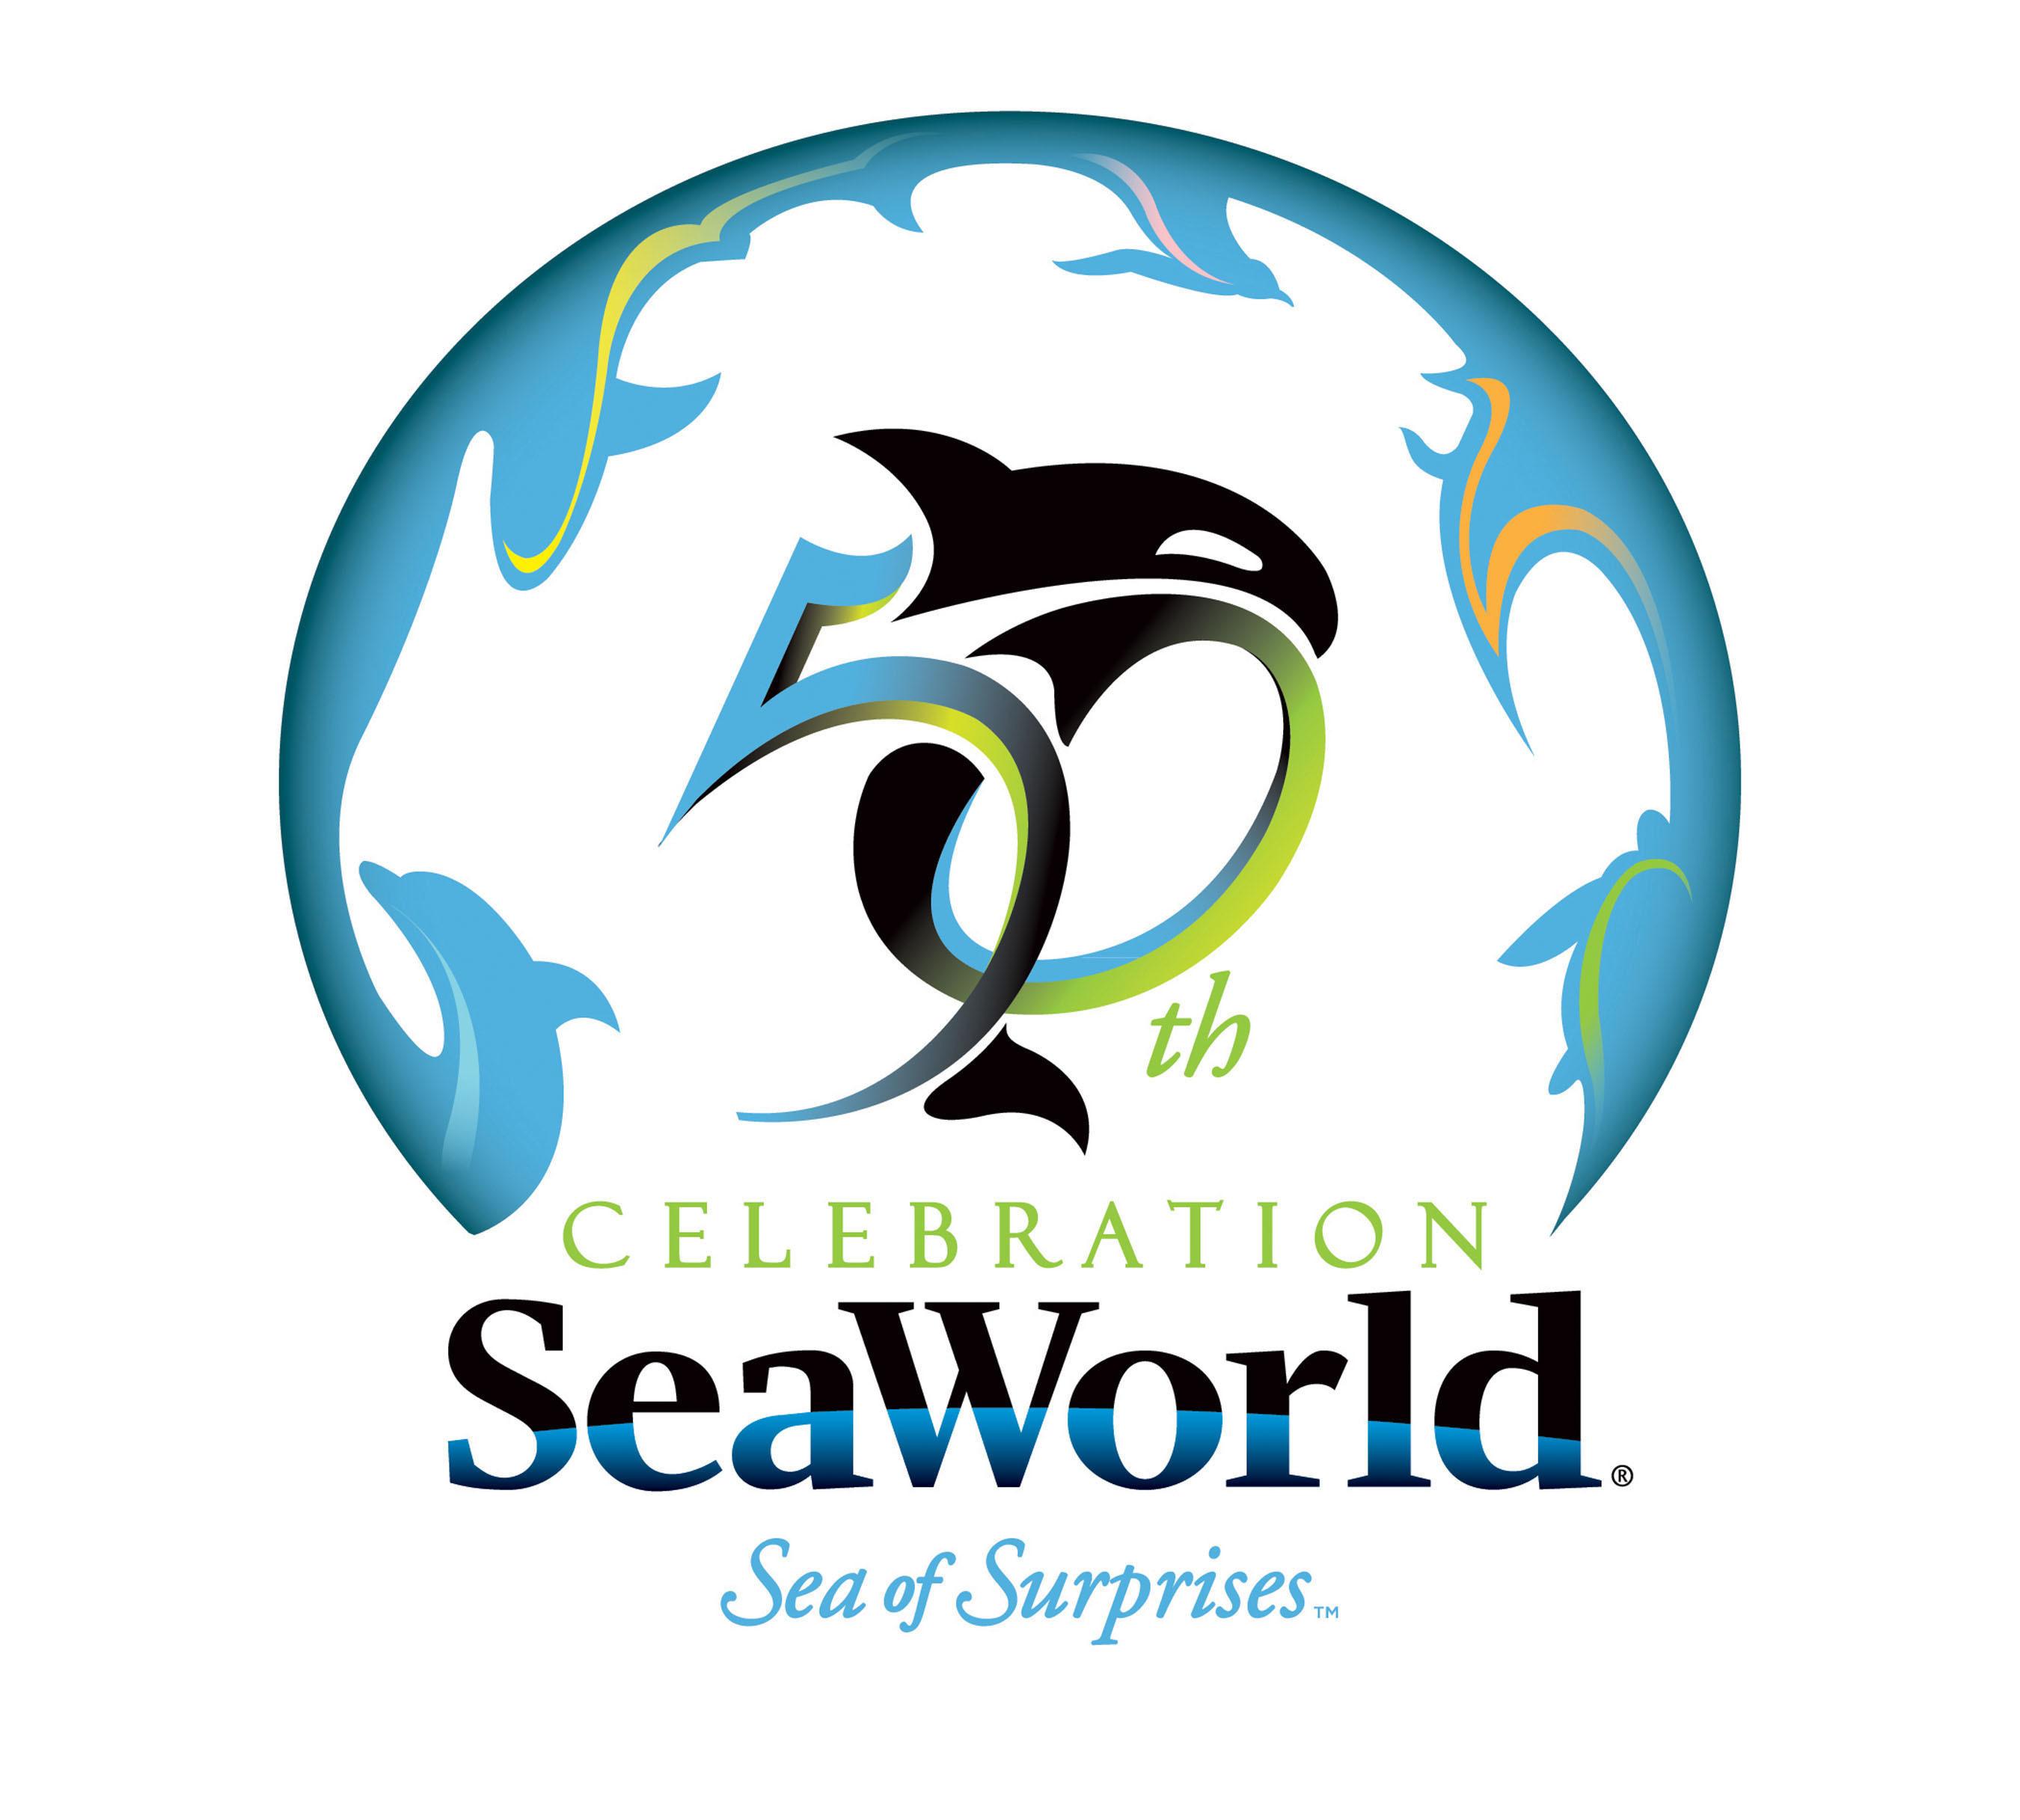 SeaWorld's 50th celebration is a Sea of Surprises. (PRNewsFoto/SeaWorld Parks & Entertainment) (PRNewsFoto/SEAWORLD PARKS & ENTERTAINMENT)